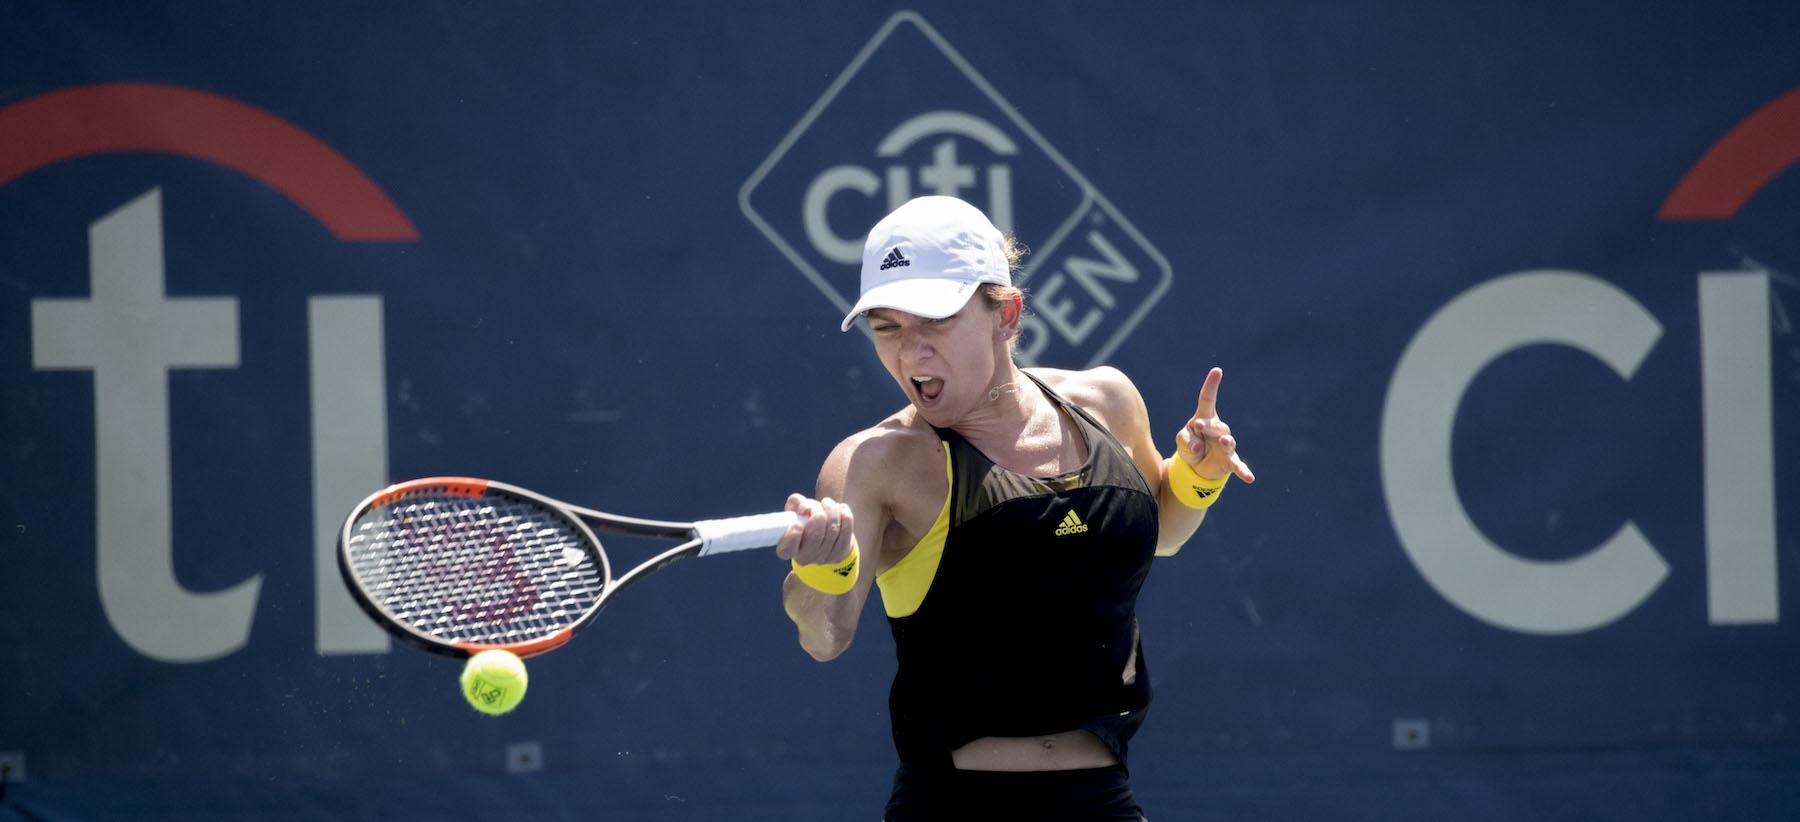 2017 Citi Open Tennis Simona Halep (35540503664)